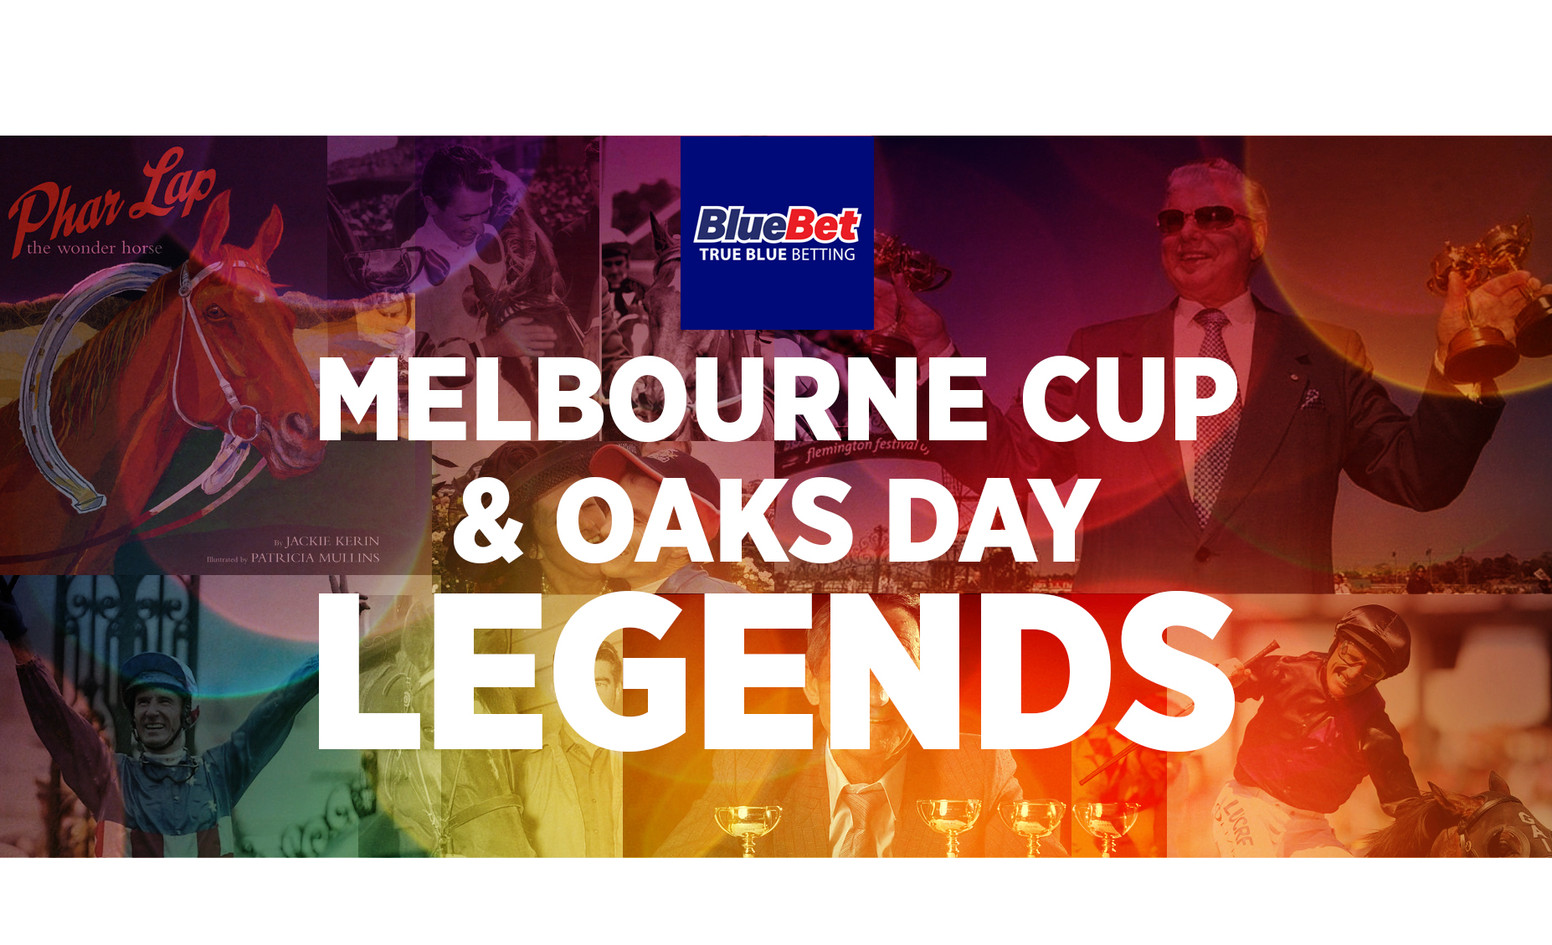 Melbourne Cup - Bluebet